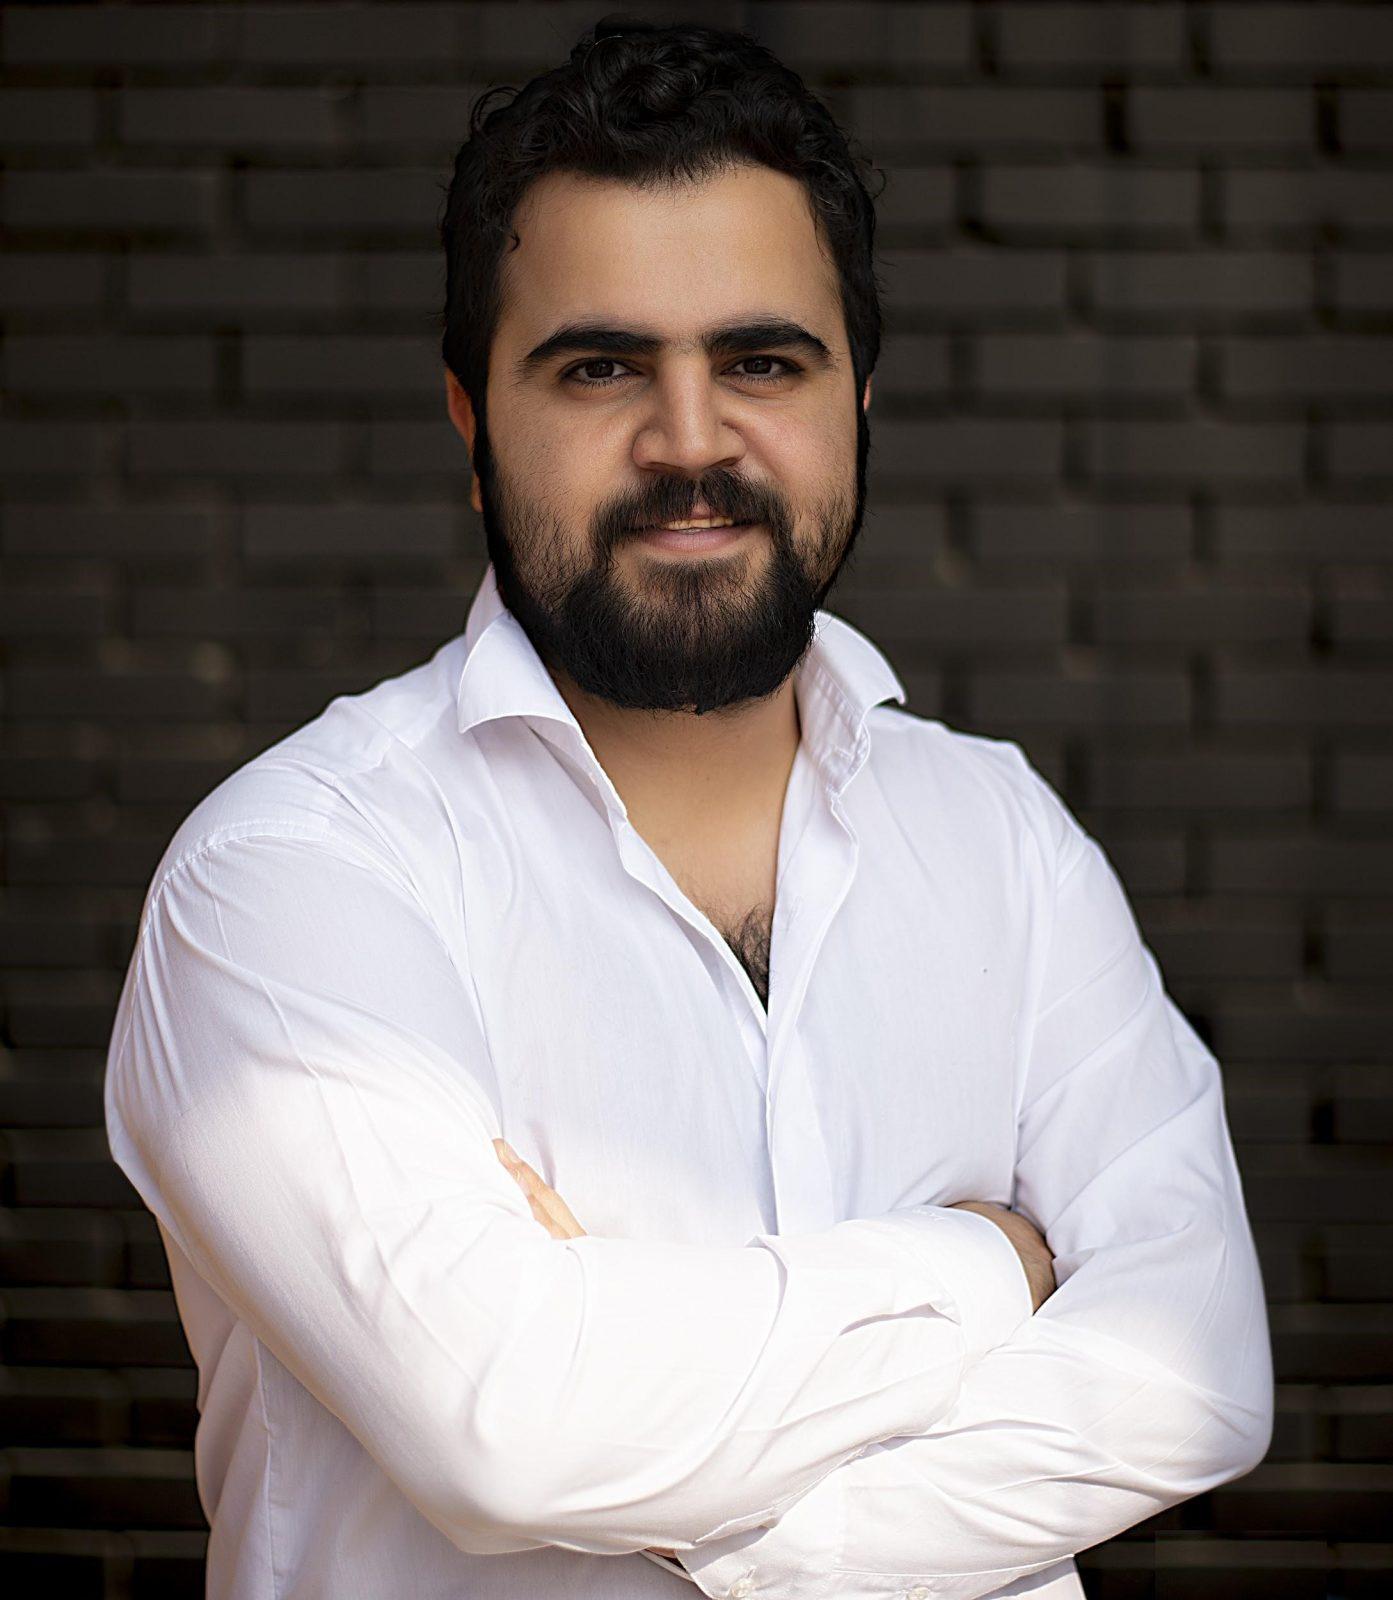 Ahmed Najm